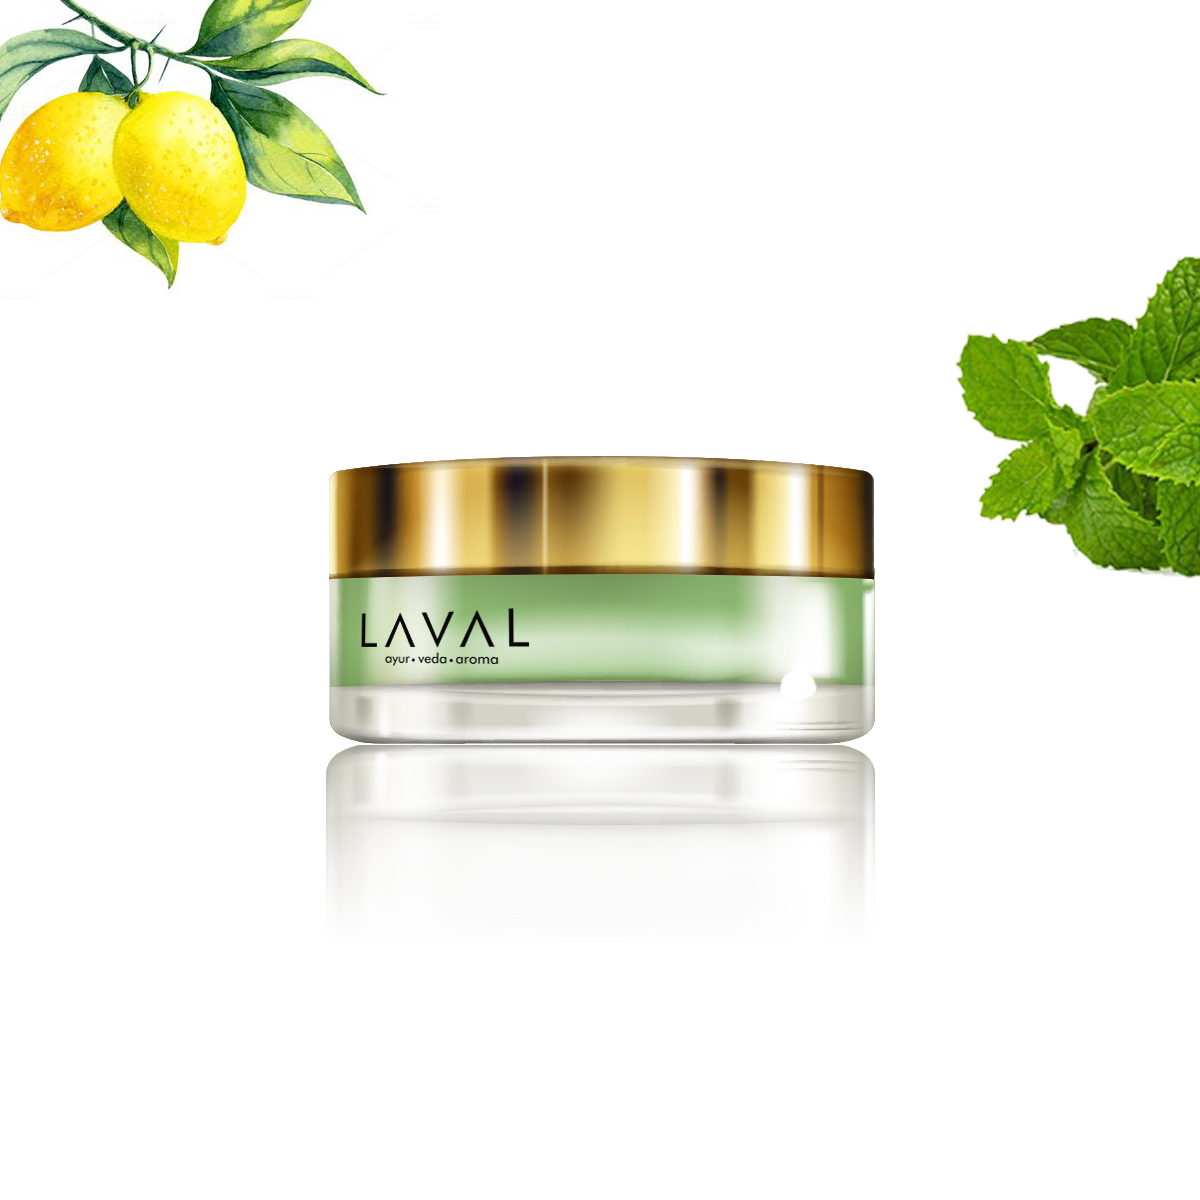 LAVAL | Spring Pond-Clarifying Lip Balm